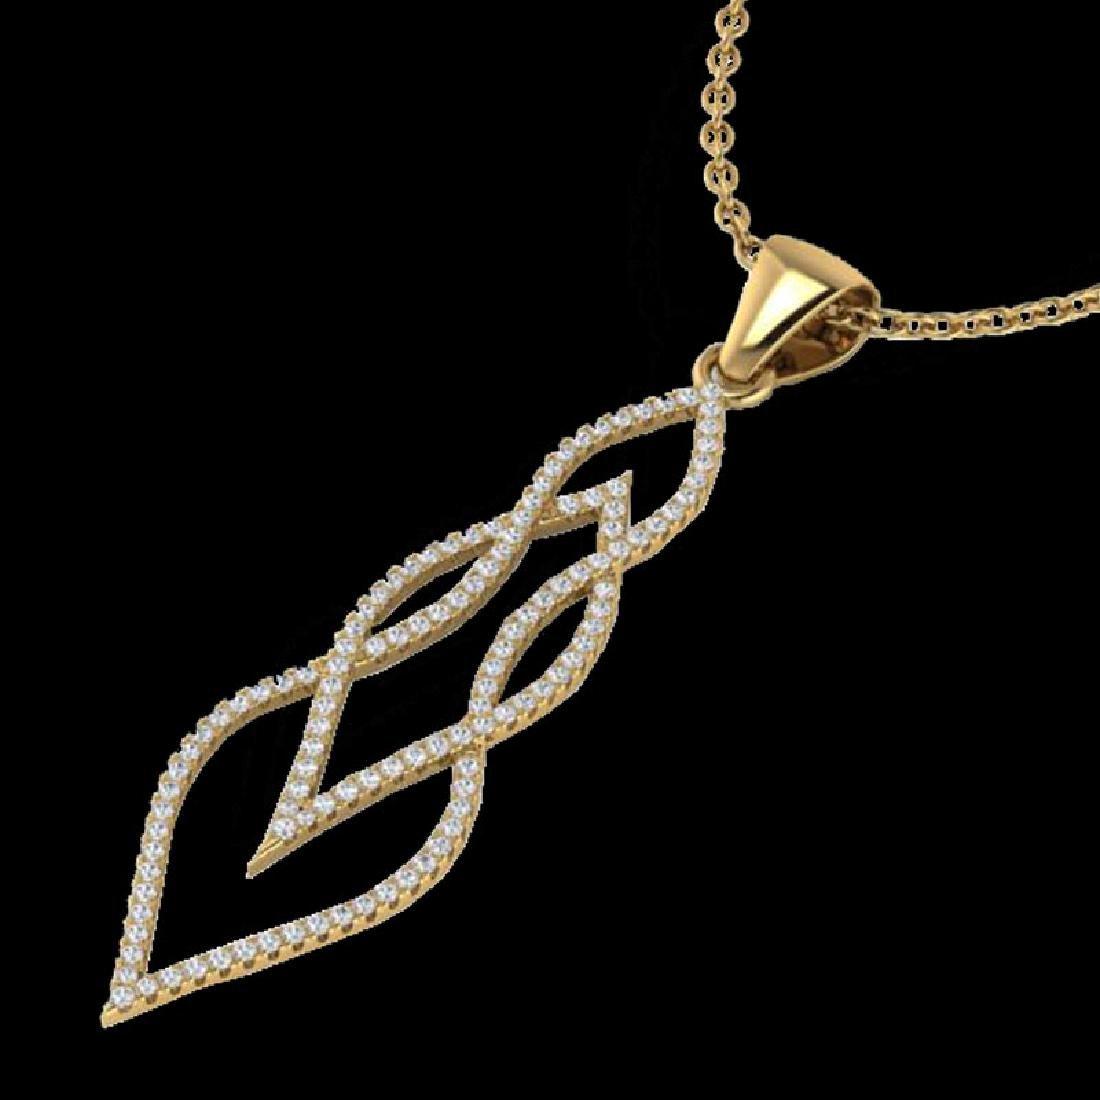 0.80 CTW Micro Pave VS/SI Diamond Necklace 14K Yellow - 2